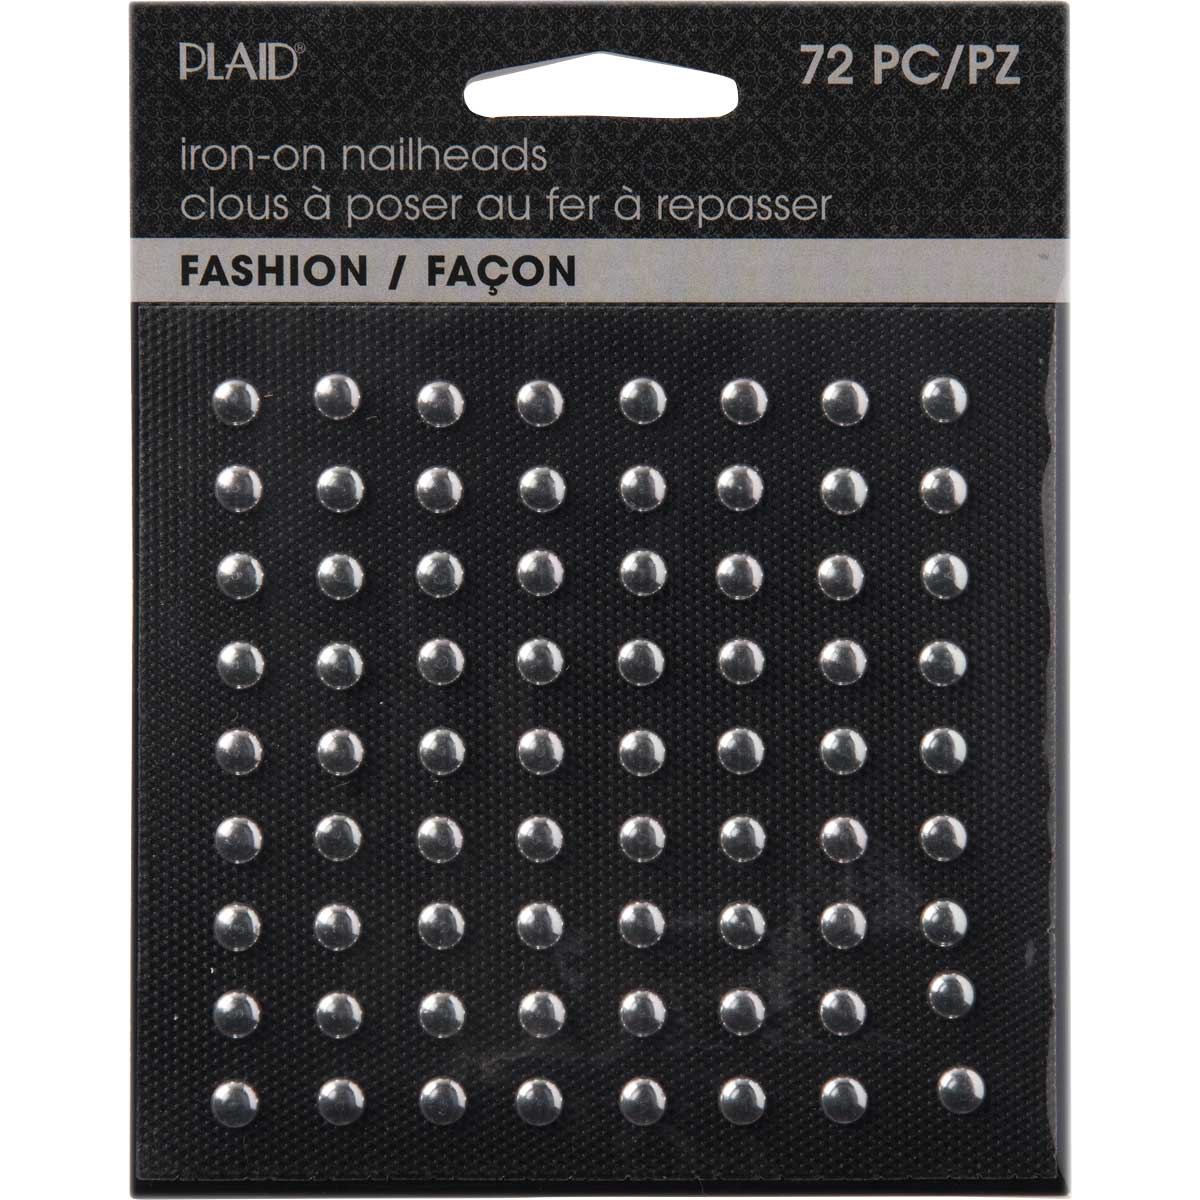 Plaid ® Hot Fix Nailhead Iron-Ons - Round Shiny Silver - 71024